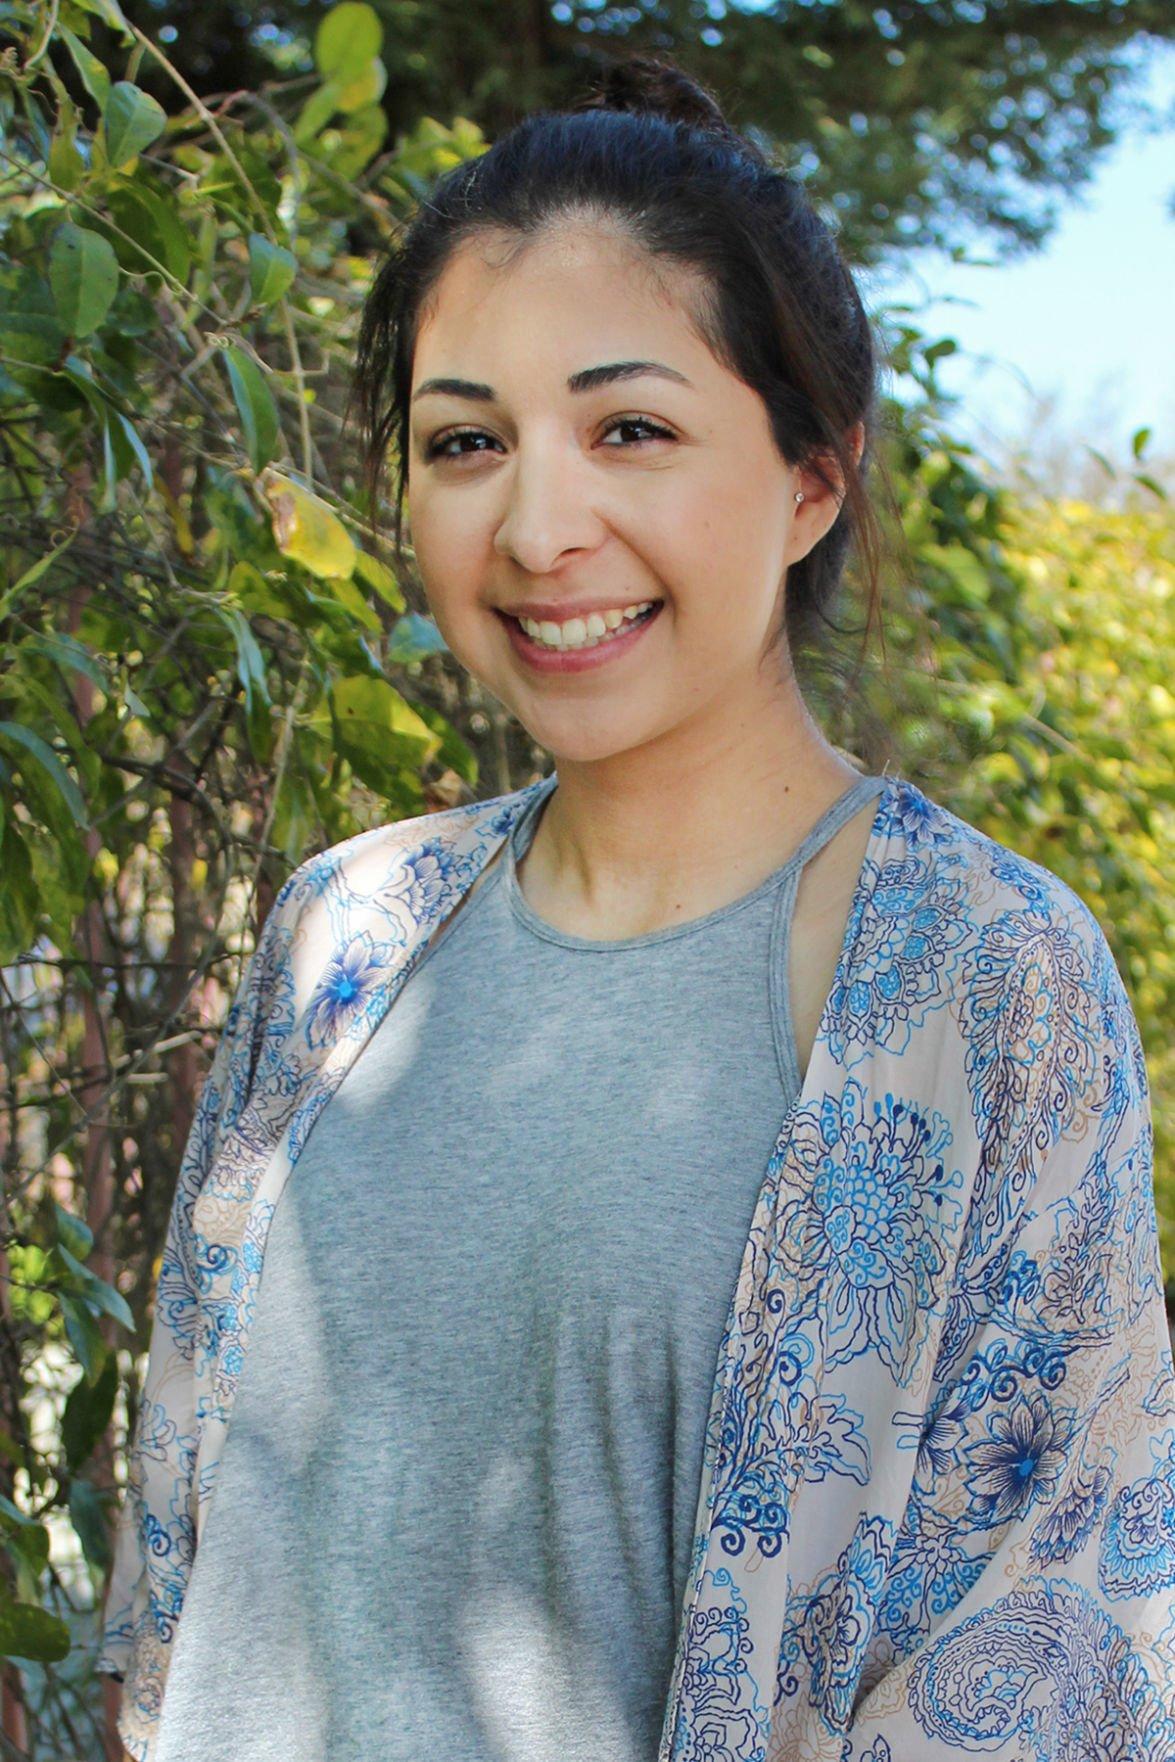 Candidates: Alyna Esquivel